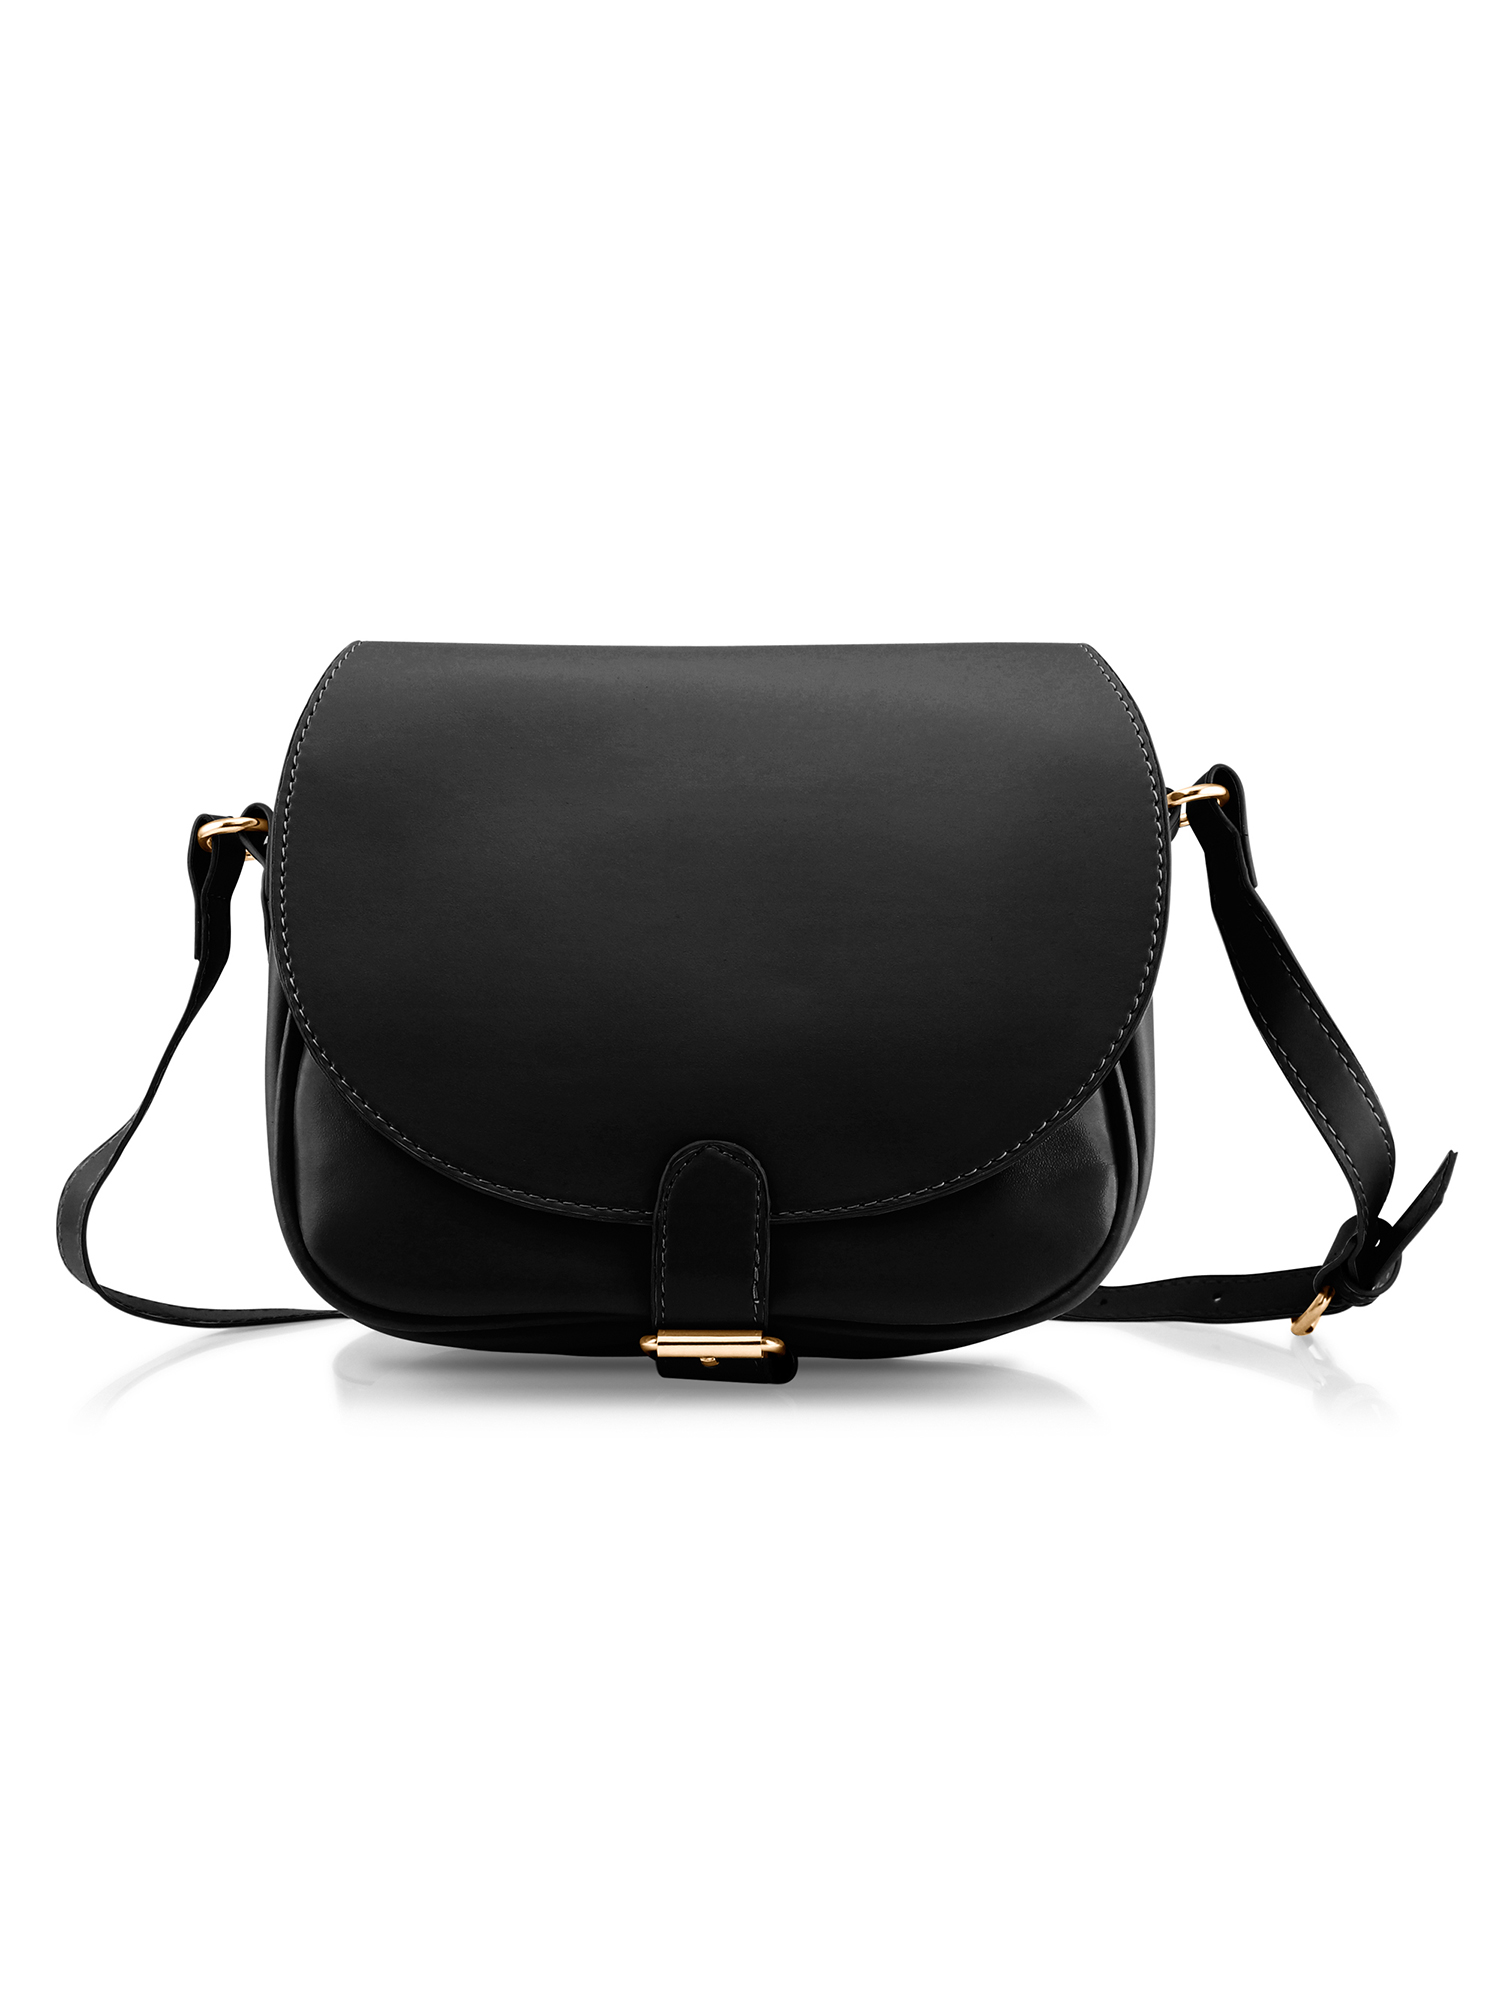 7ffb0492d695 GEARONIC TM - Fashion Women Crossbody Handbag PU Leather Shoulder Bag Tote Purse  Ladies Satchel Messenger Hobo Bags - Walmart.com